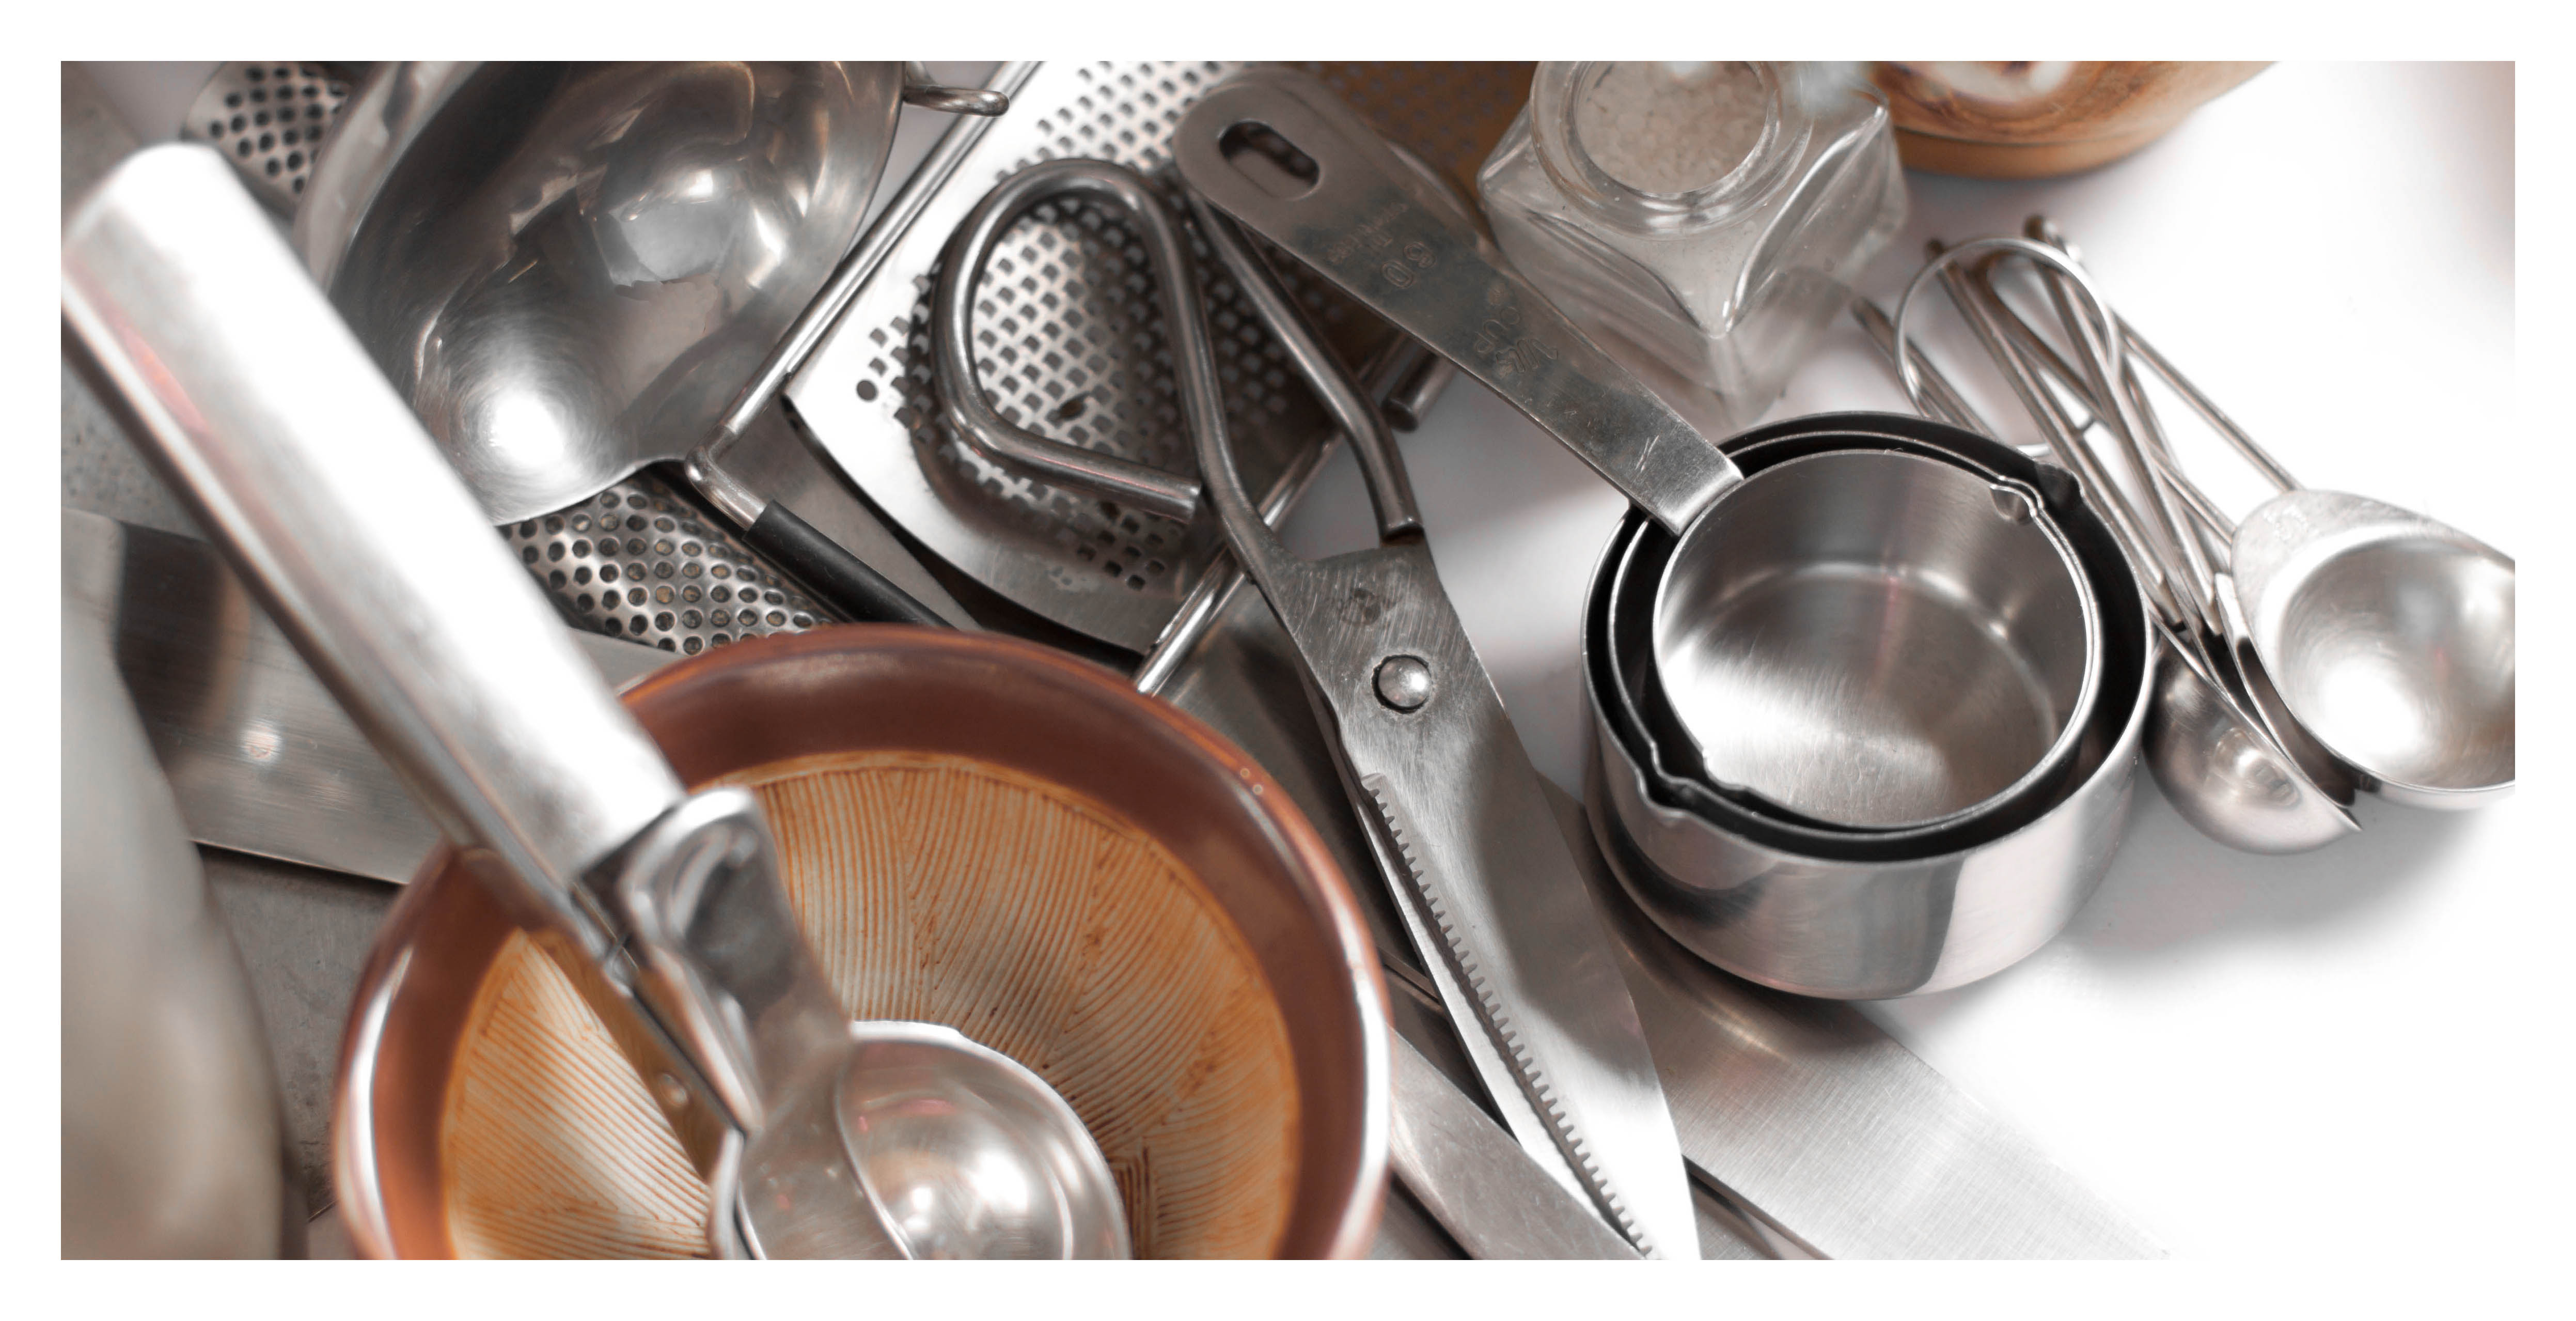 Enseres de cocina el oso con botas for Utensilios de cocina tumblr